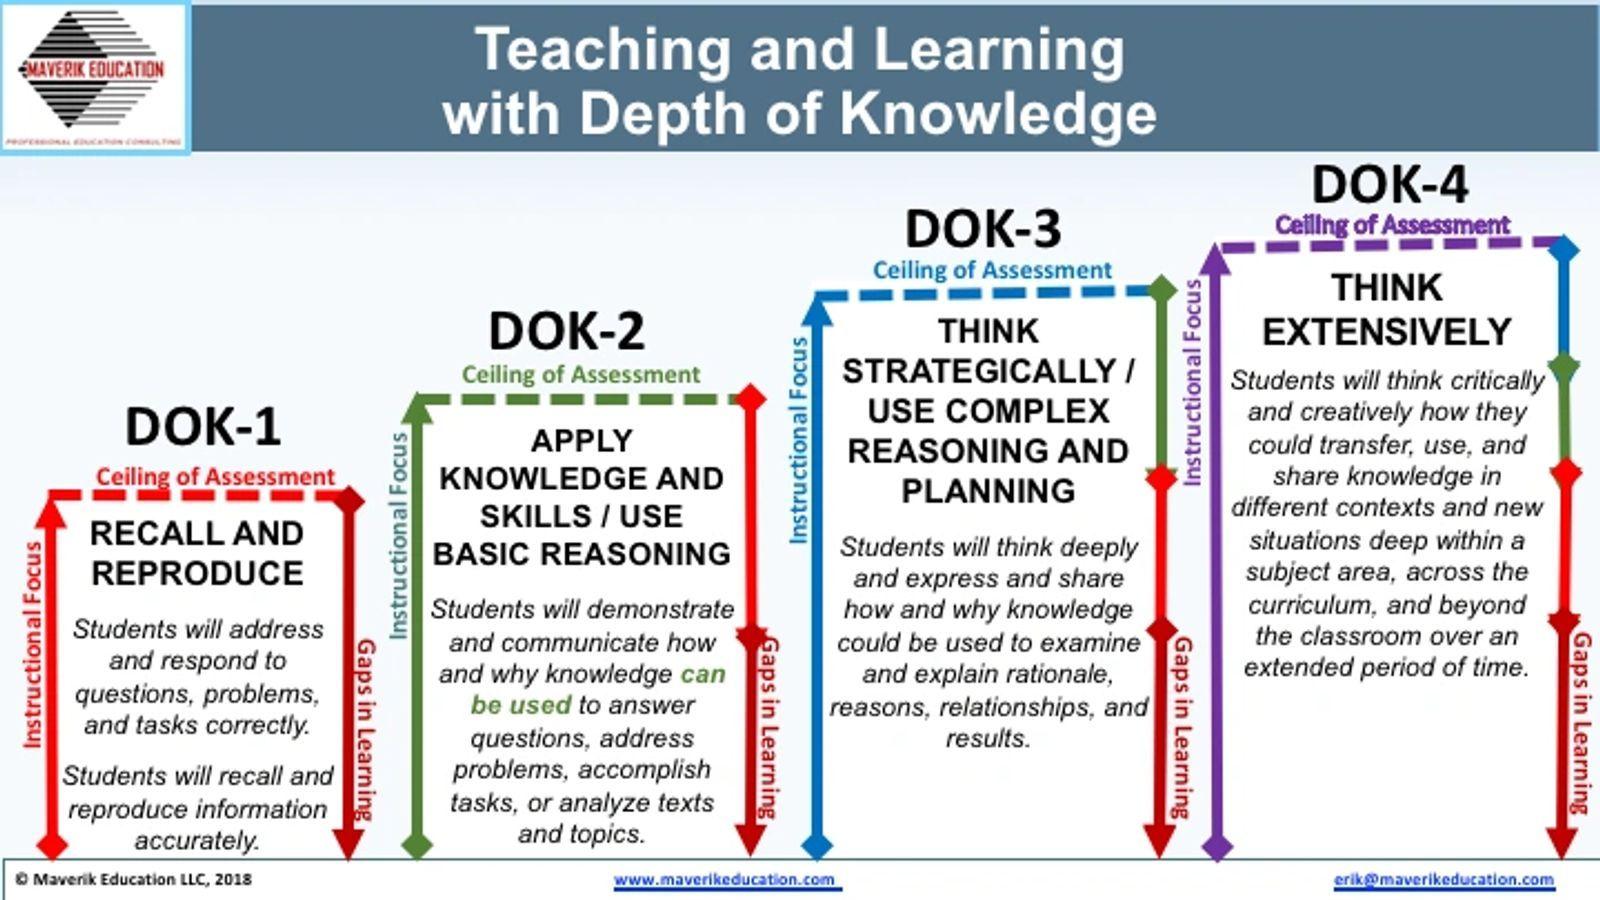 Depth Of Knowledge Dok Webb S D O K Webb S Depth Of Knowledge Model How To Memorize Things Depth Of Knowledge Teaching